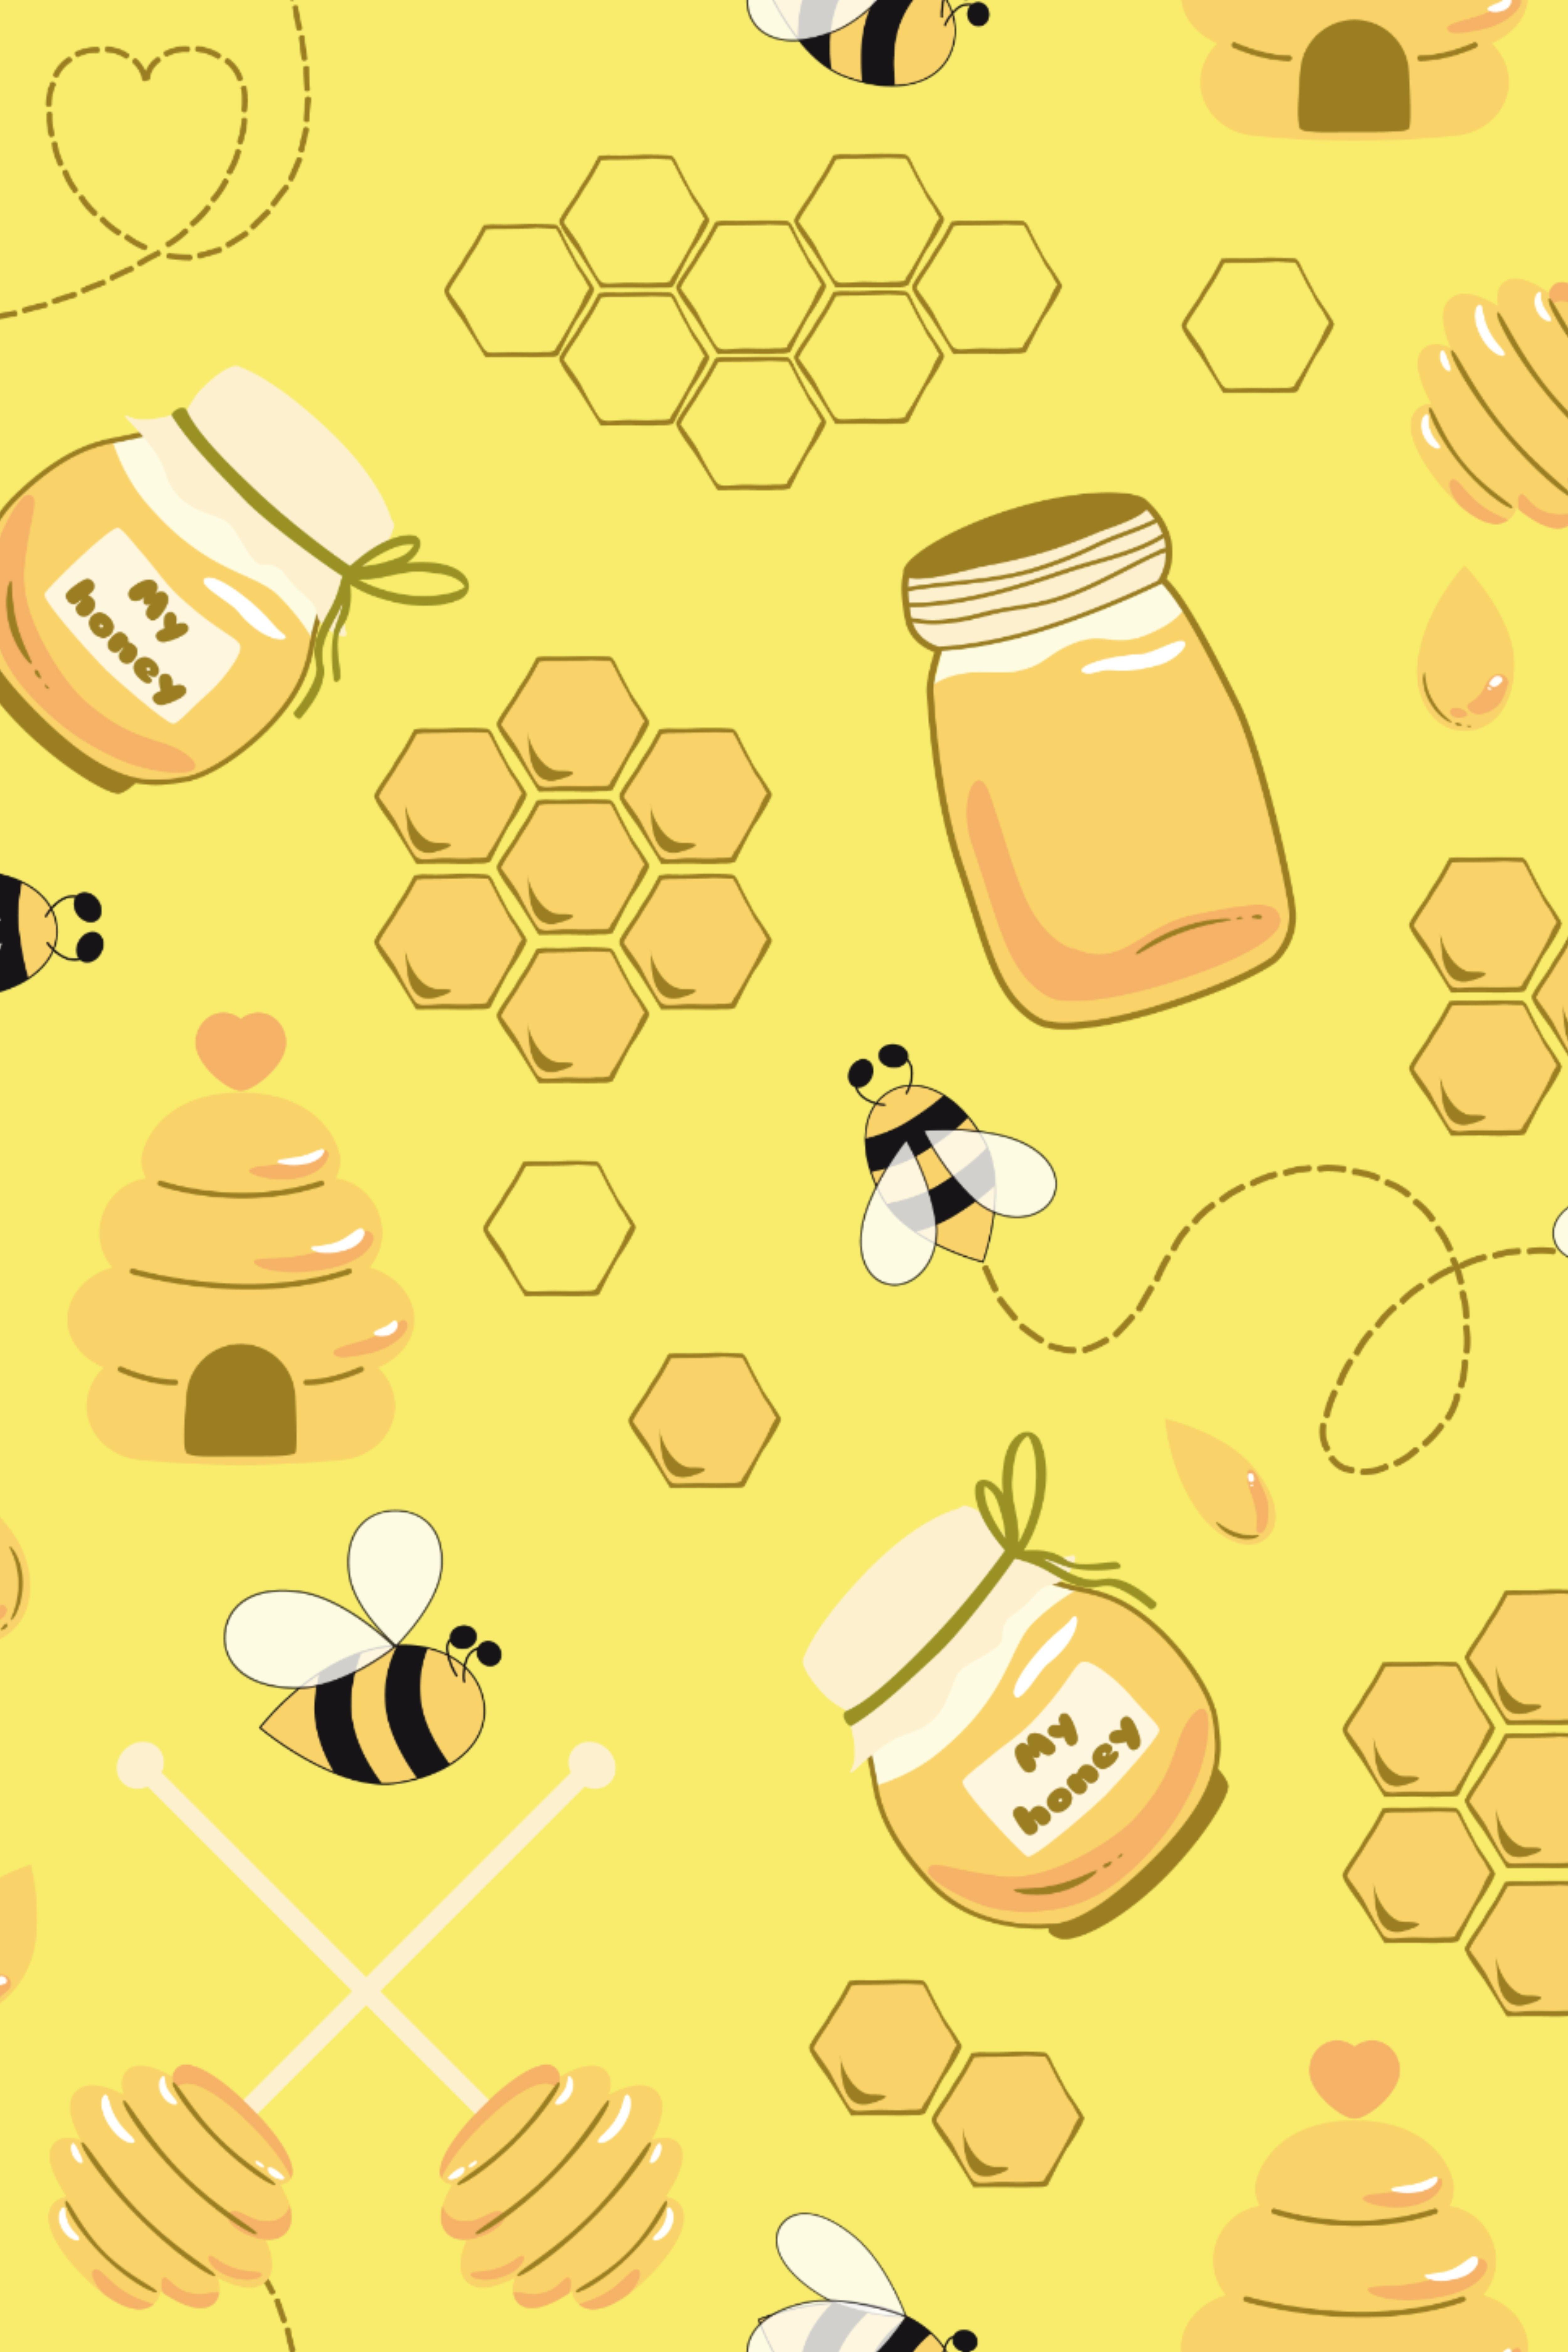 10 Honey Bee Patterns Cute Bee Honey Bee Cartoon Cute Bee Cute Patterns Wallpaper